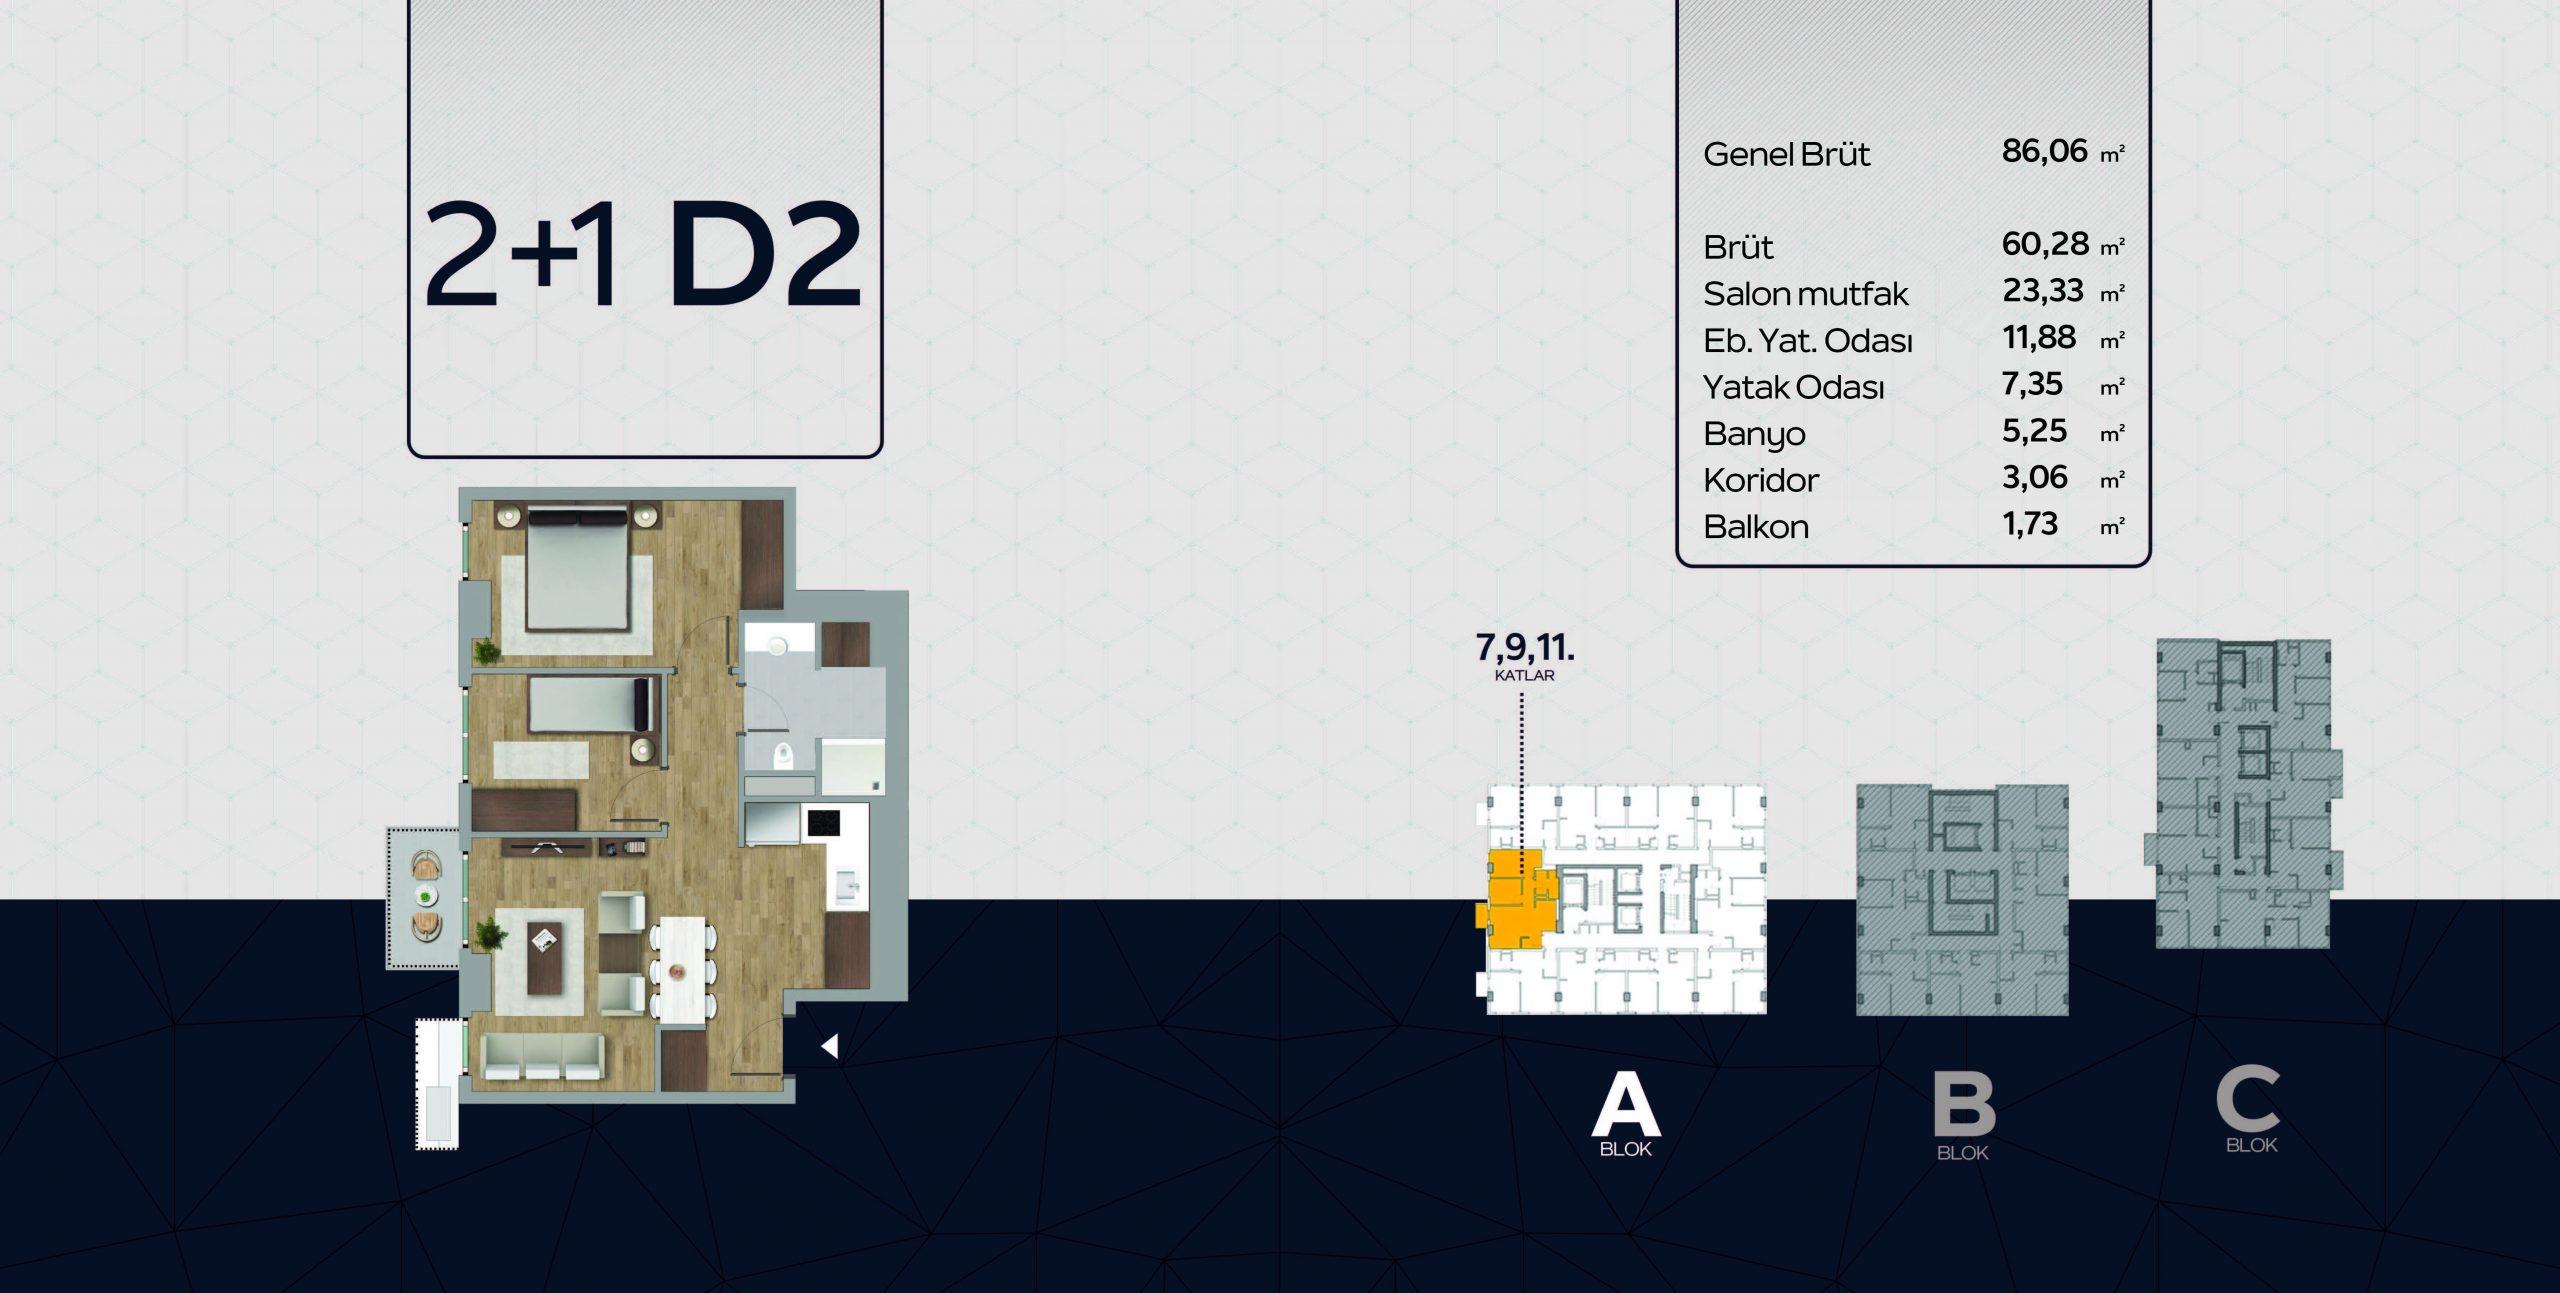 2+1 D2